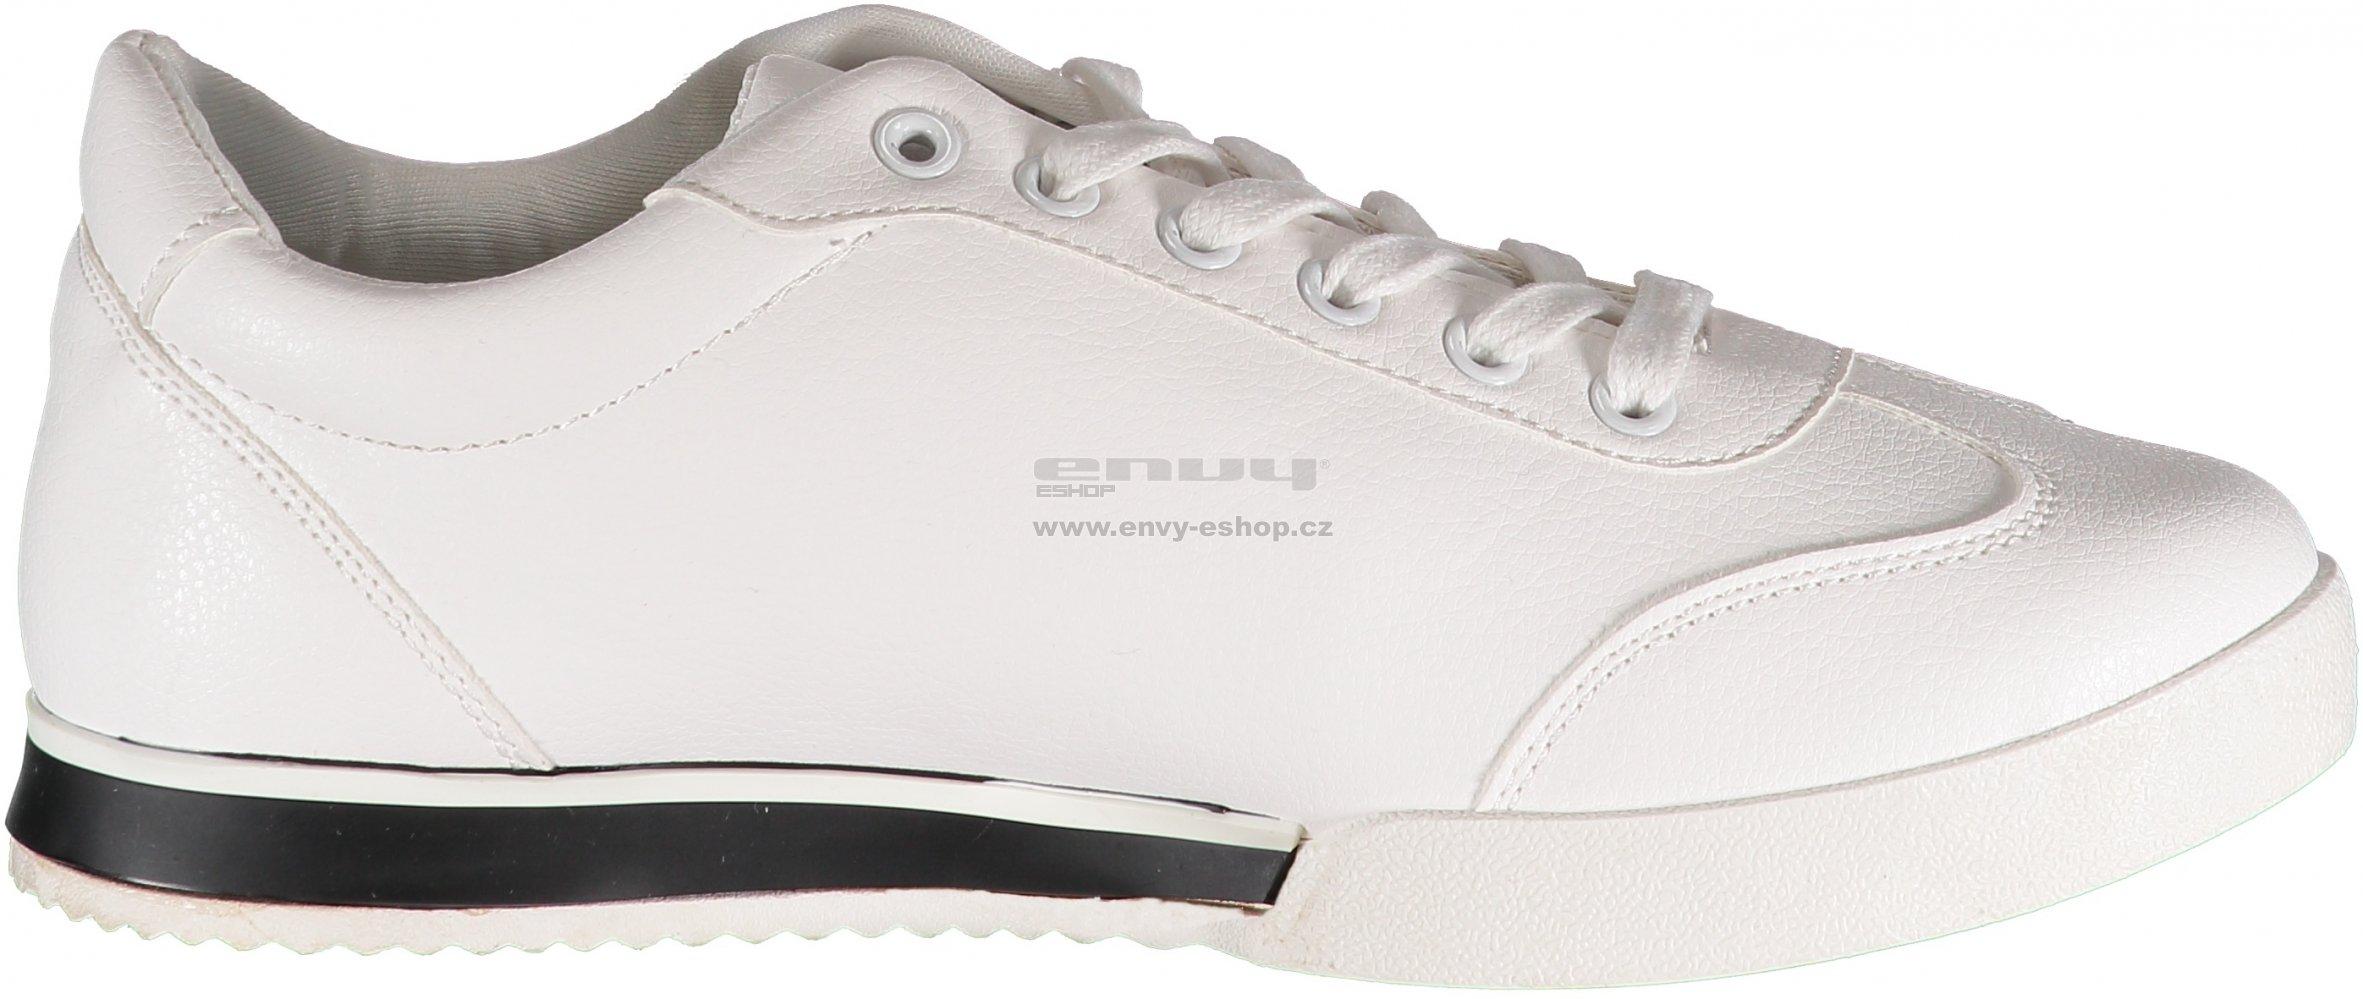 aba9851b992 Dámské boty VICES 8398-41 WHITE velikost  36   ENVY-ESHOP.cz